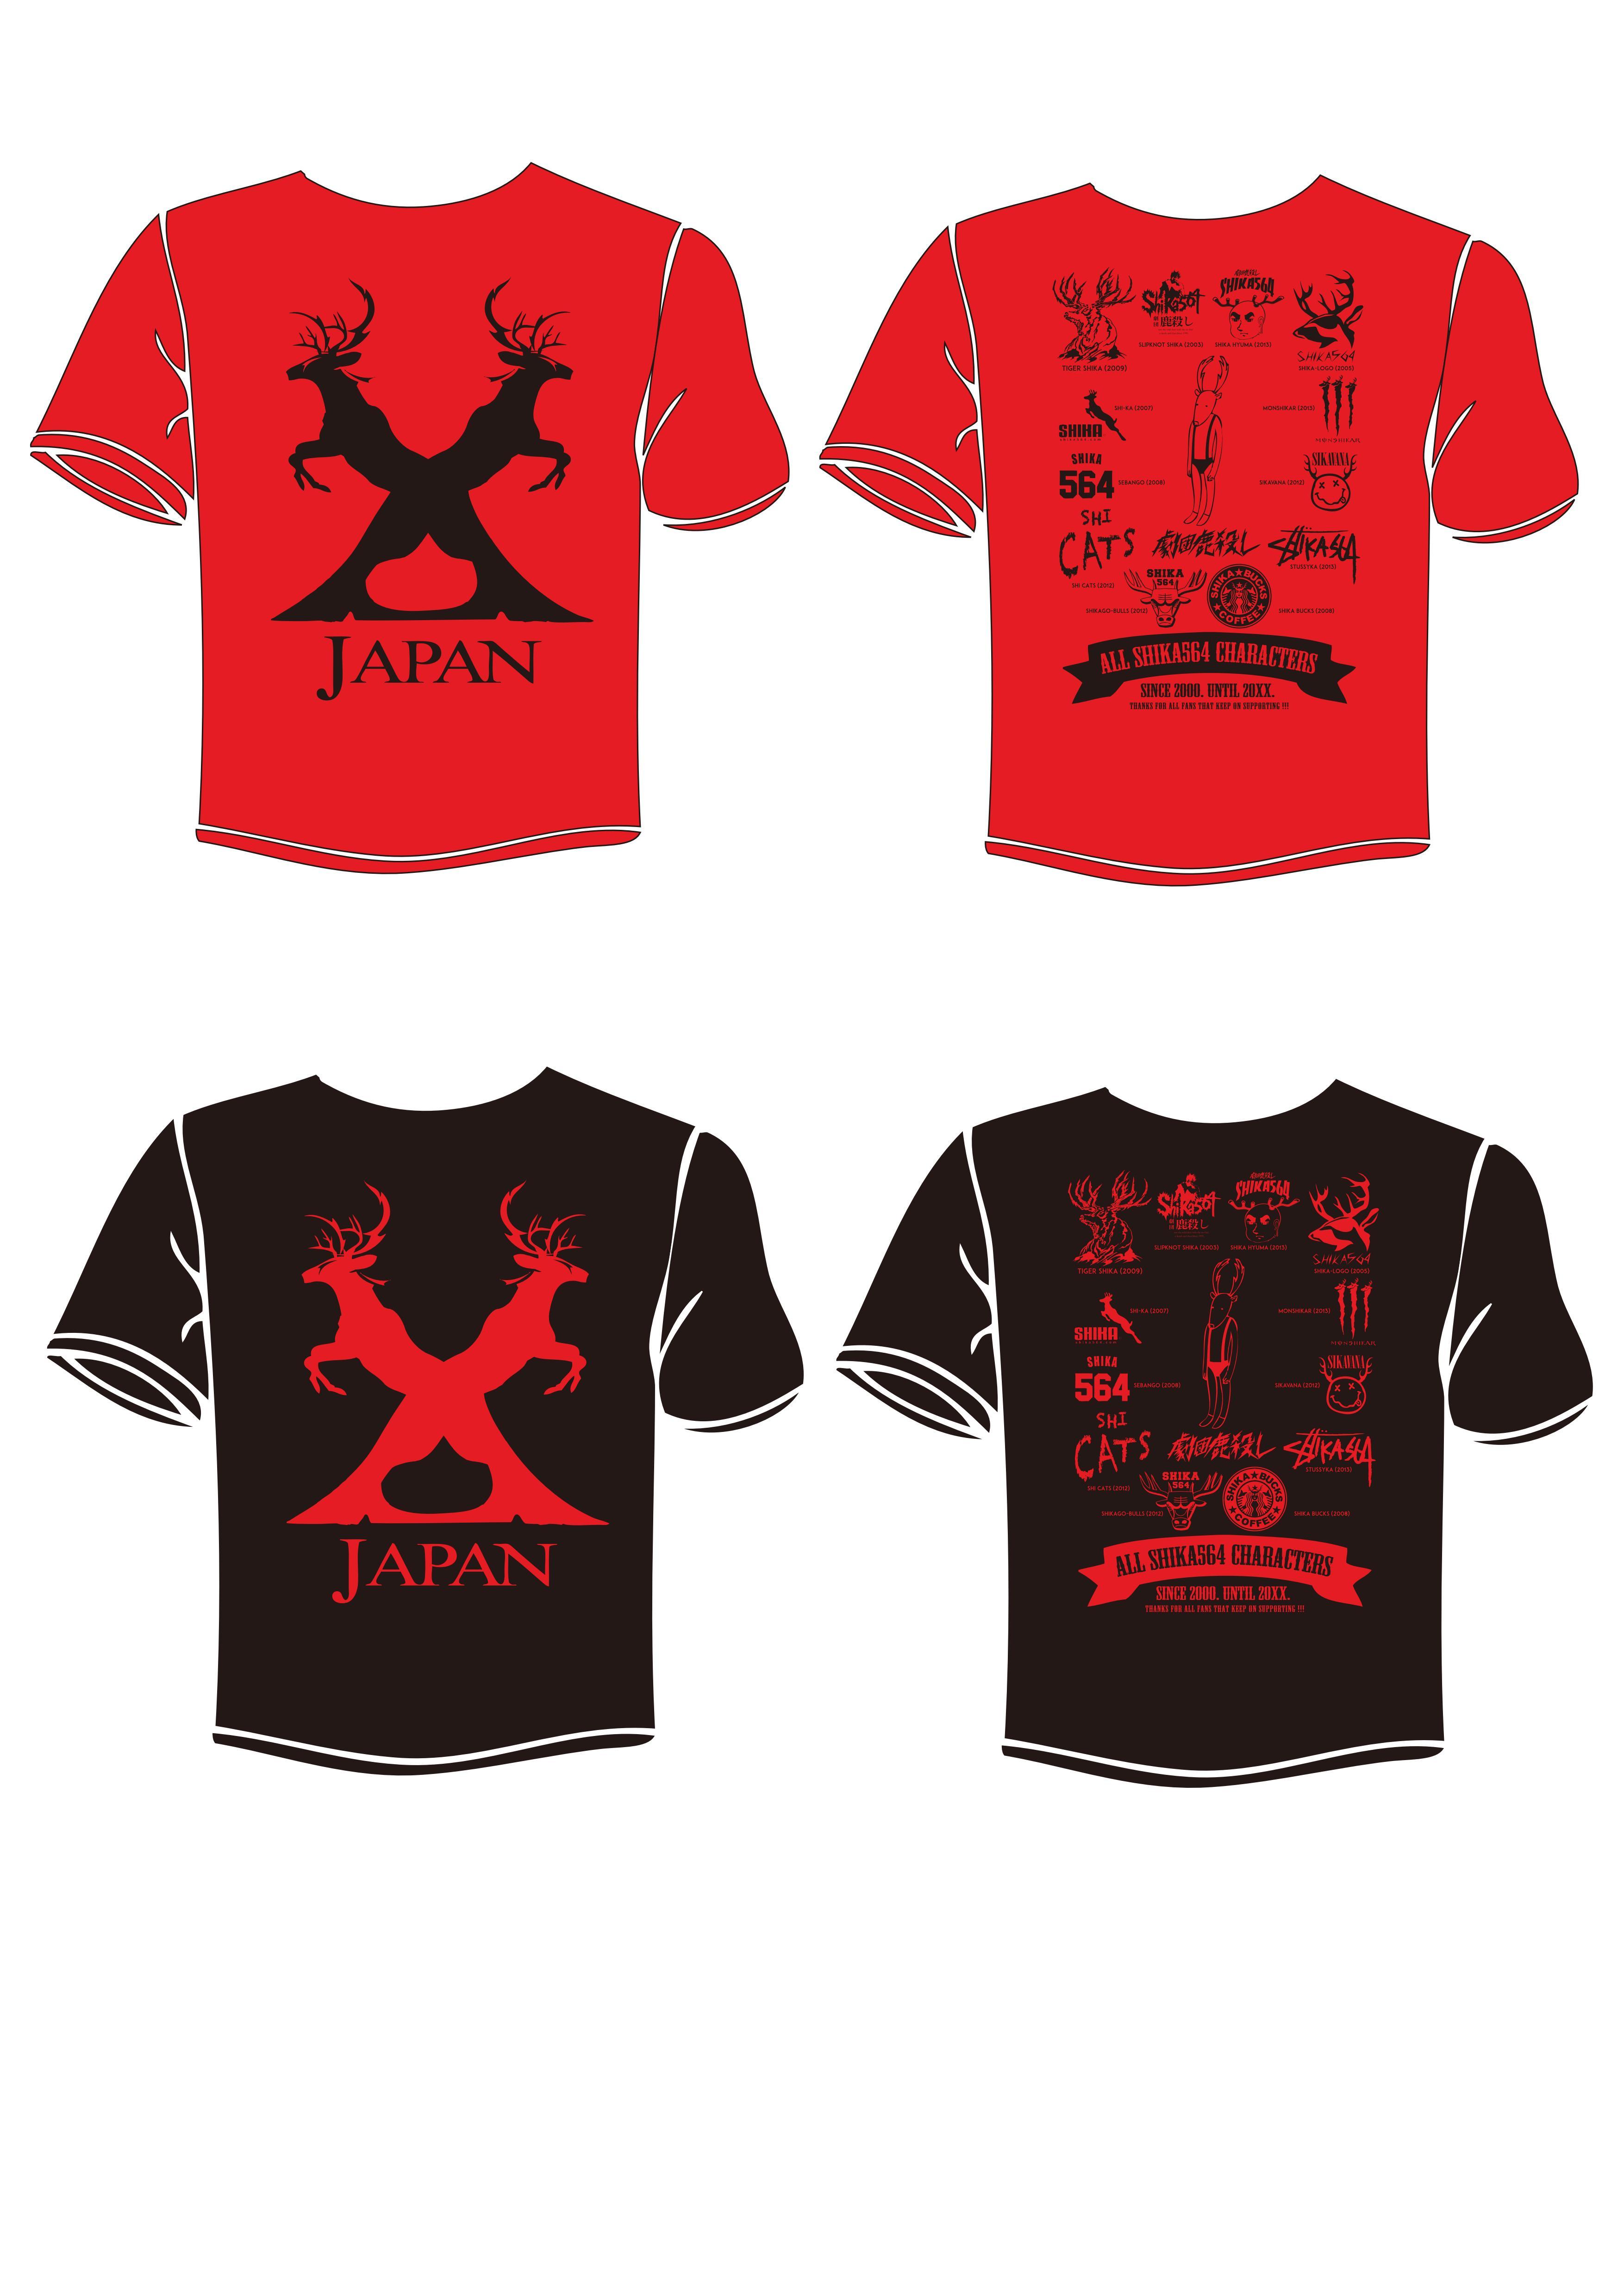 【1.3】OFFICE SHIKA PRODUCE「山犬」DVD、ますださえこ×劇団鹿殺しコラボTシャツほか、新アイテム 全ラインナップを公開!